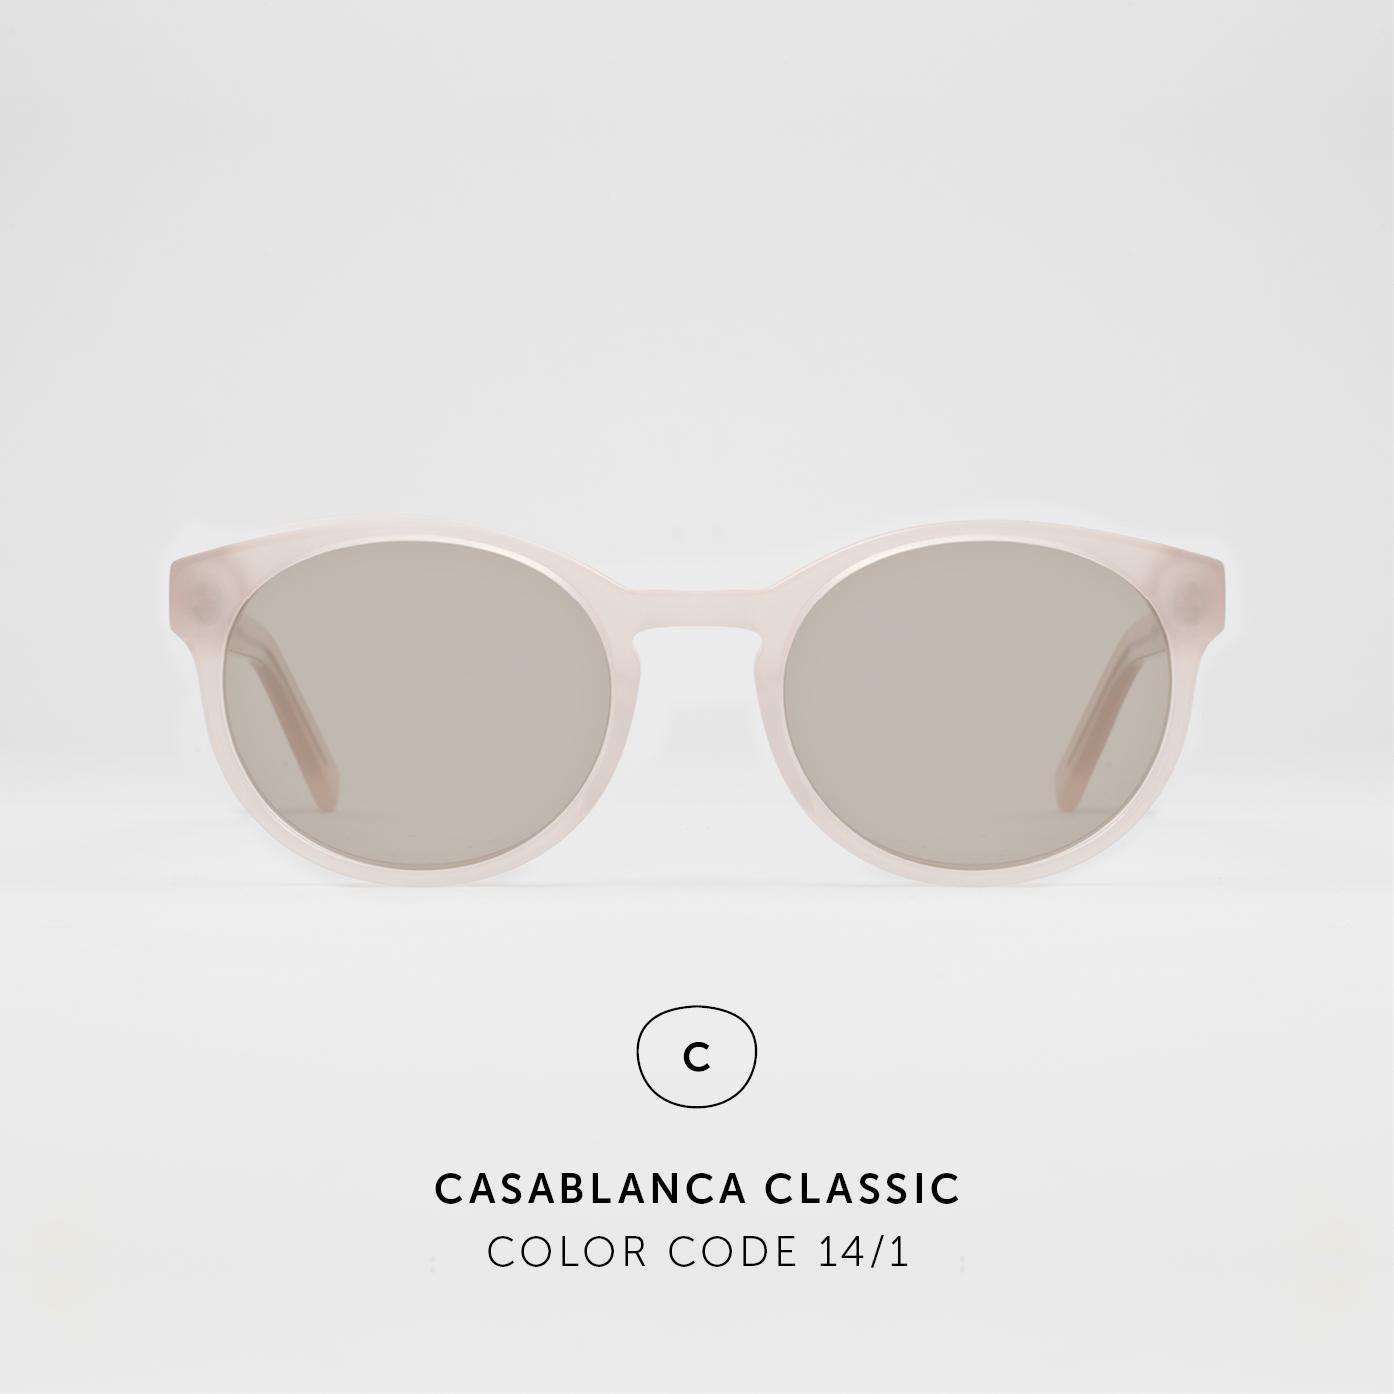 CasablancaClassic62.jpg